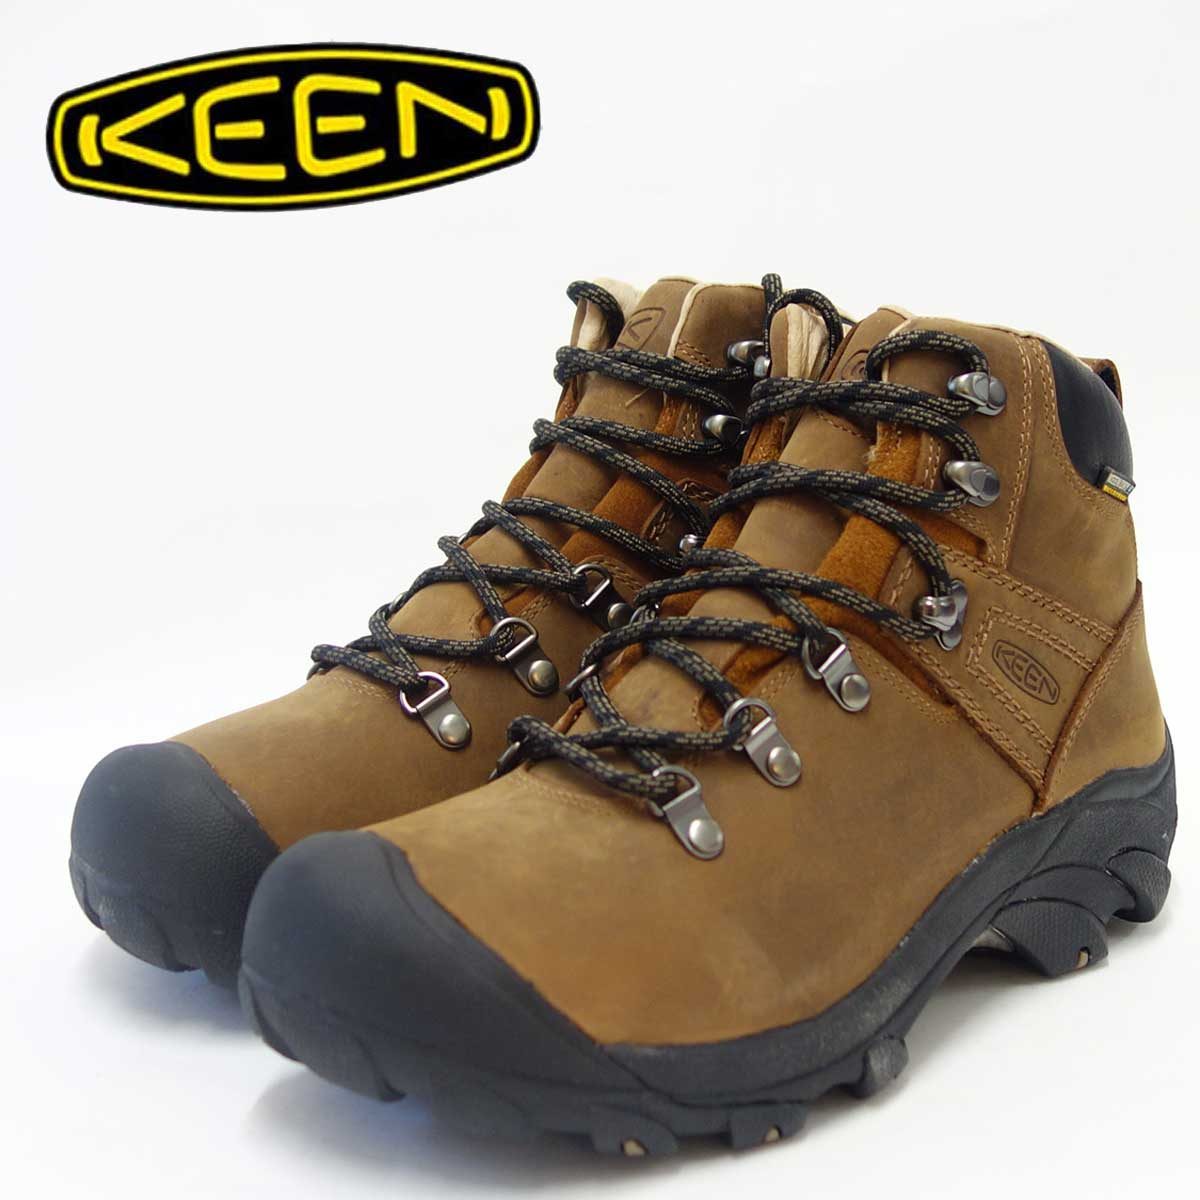 KEEN キーン Pyenees 1002435 ピレニーズ Syrup(メンズ)防水仕様、オールレザーのハイキングシューズ「靴」 父の日 ギフト